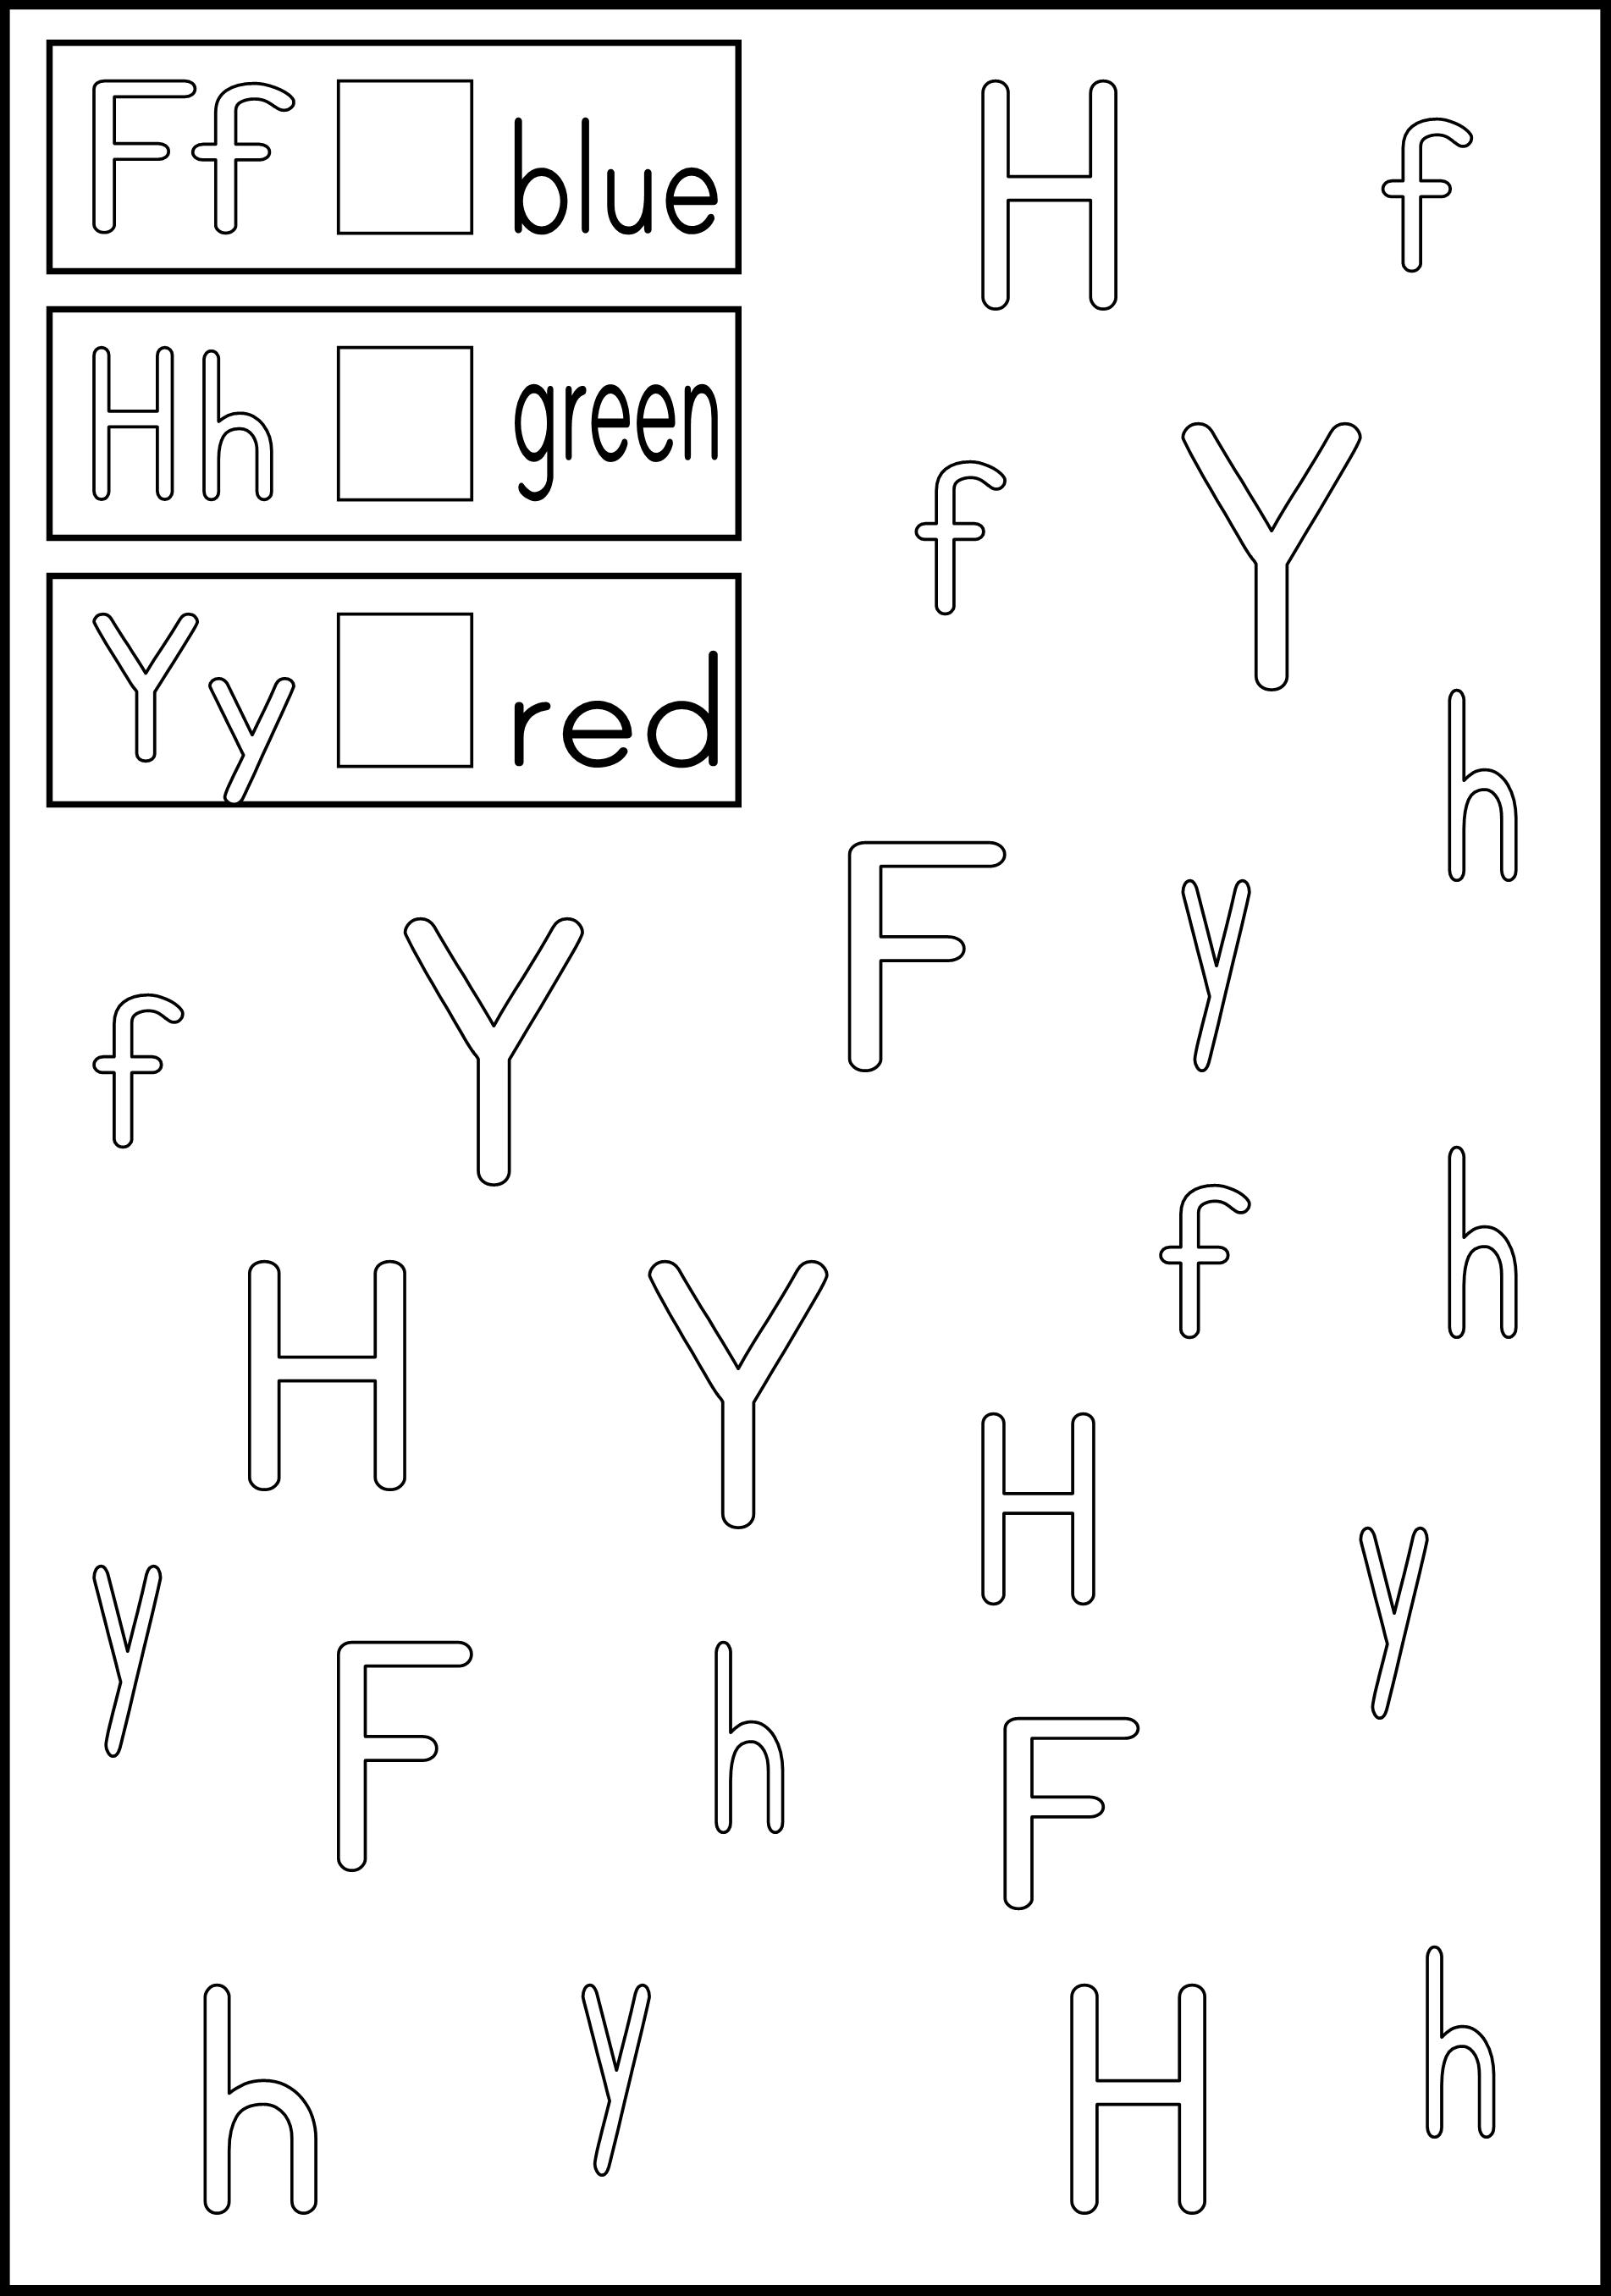 worksheet Ff Phonics Worksheets kidstv123 com alphabet worksheets teaching ideas pinterest worksheets